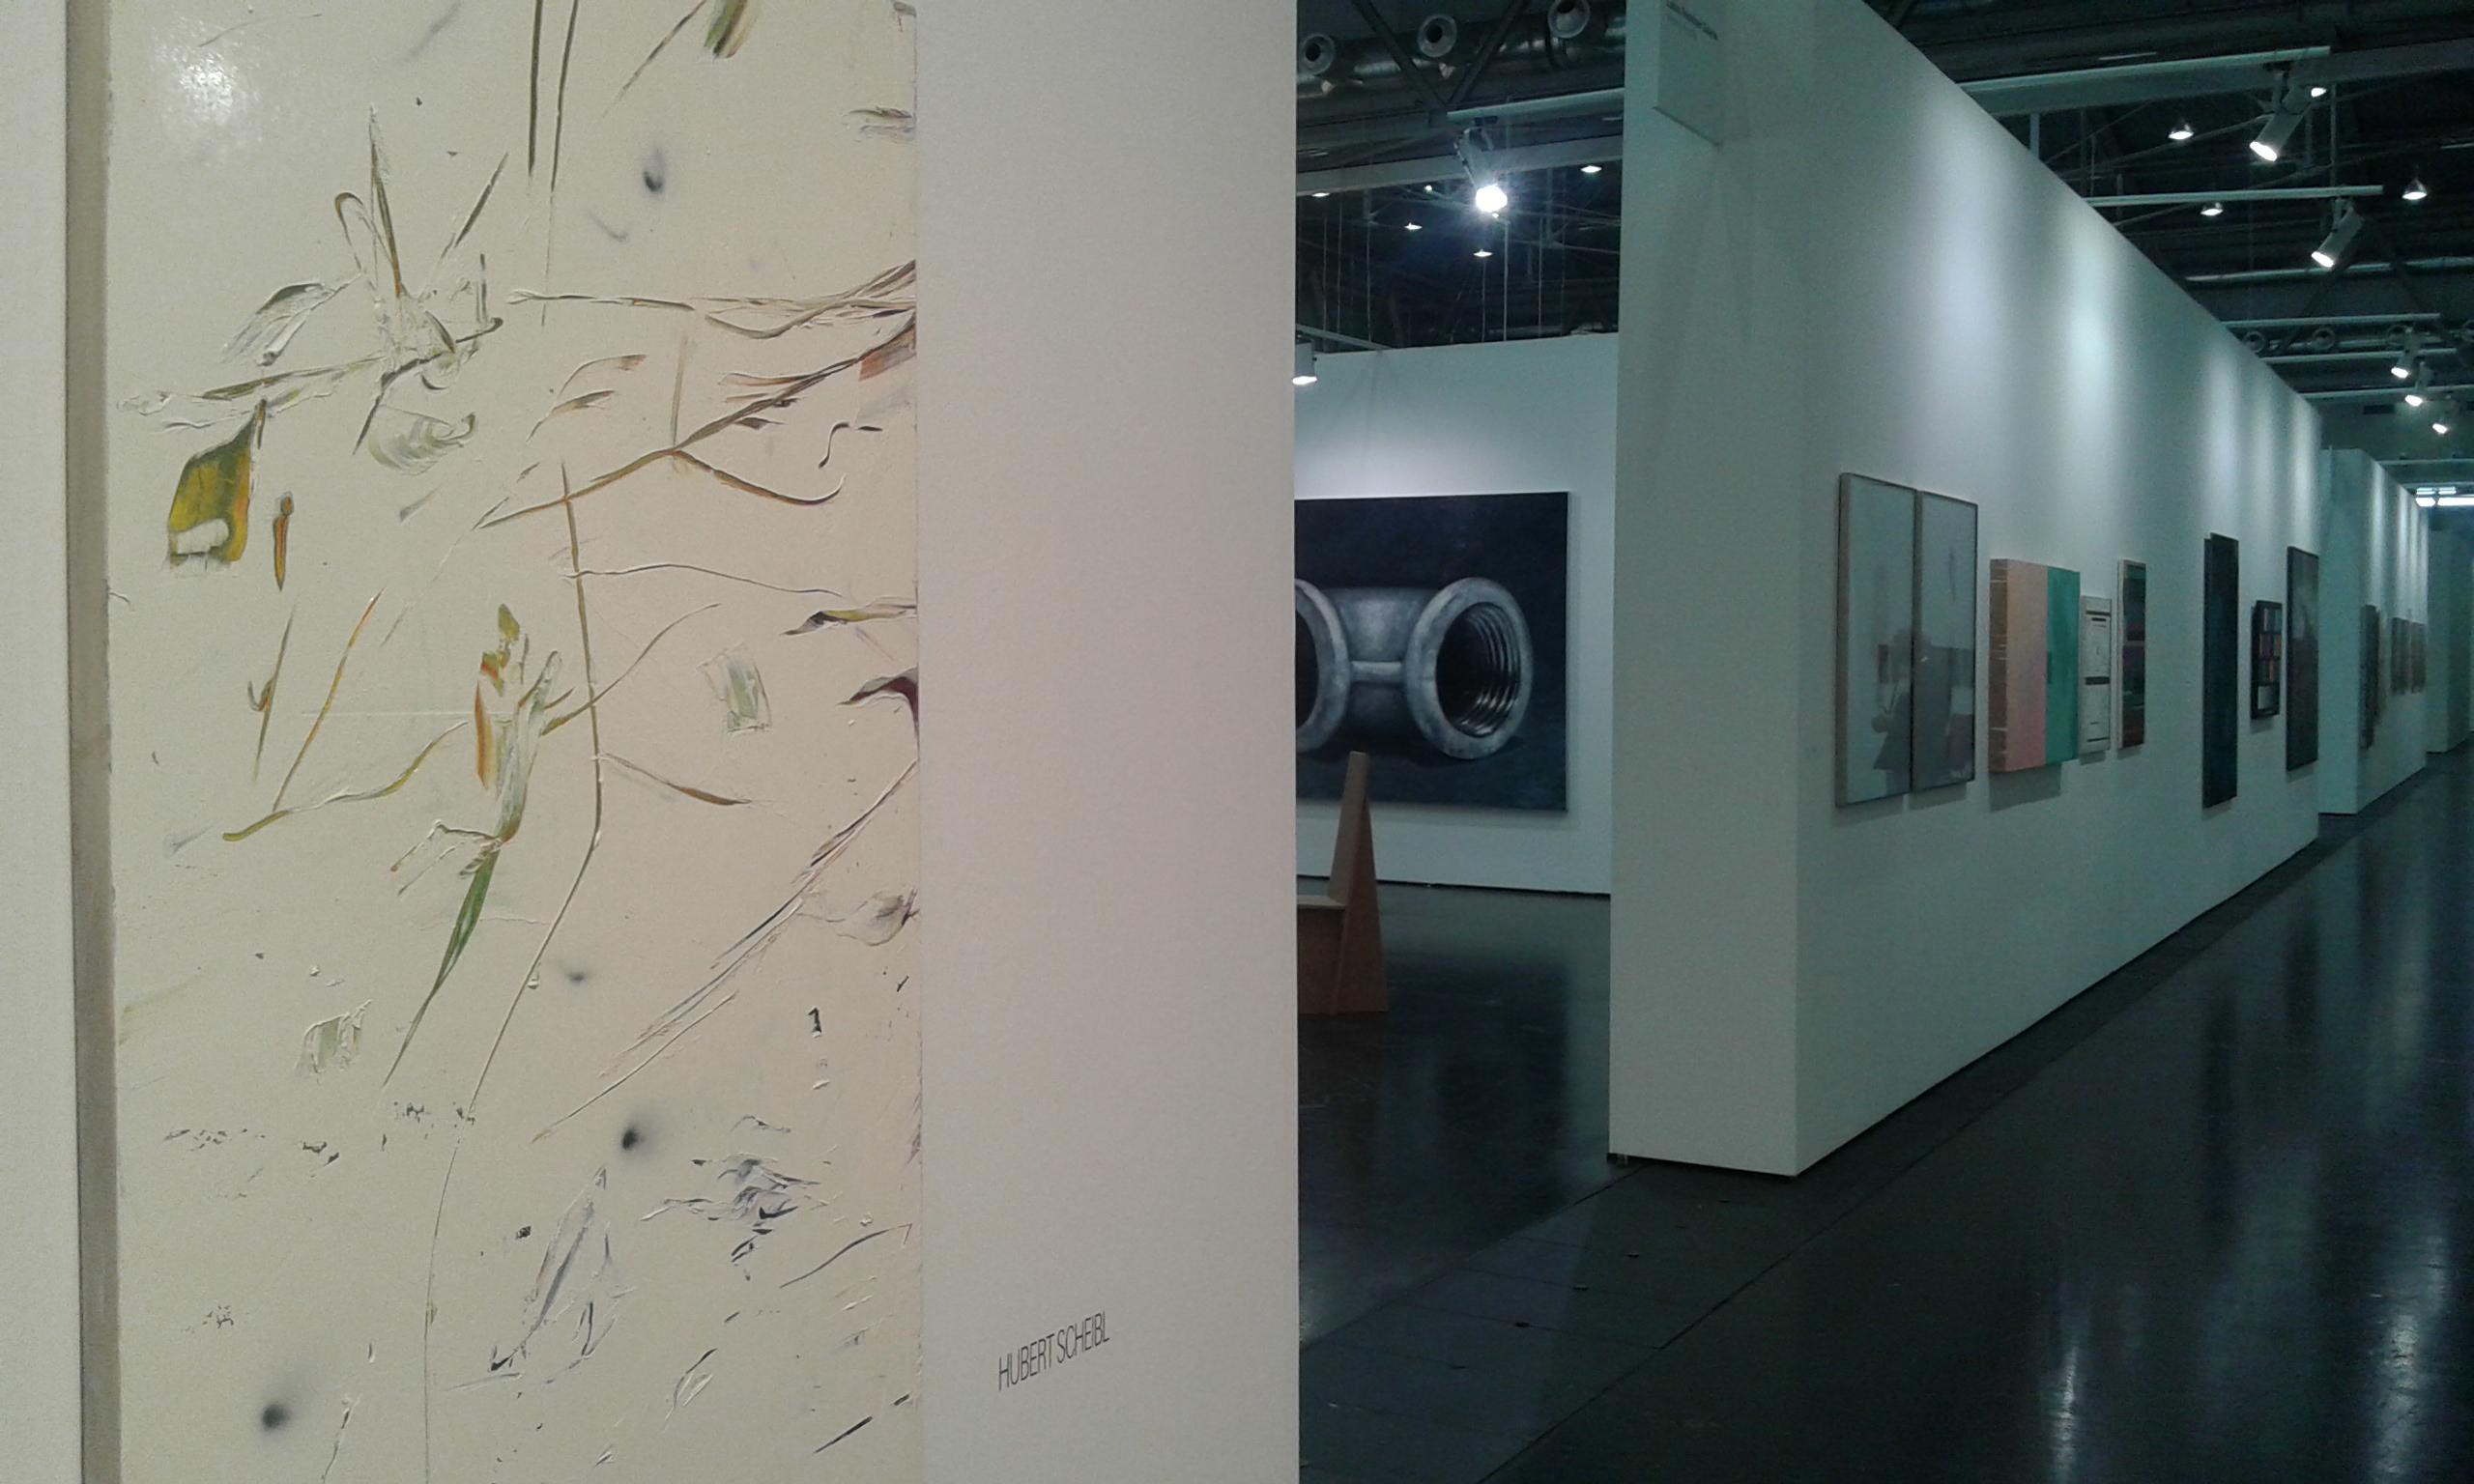 Bečki sajam umetnosti 2014, I. Foto: Dematerijalizacija umetnosti